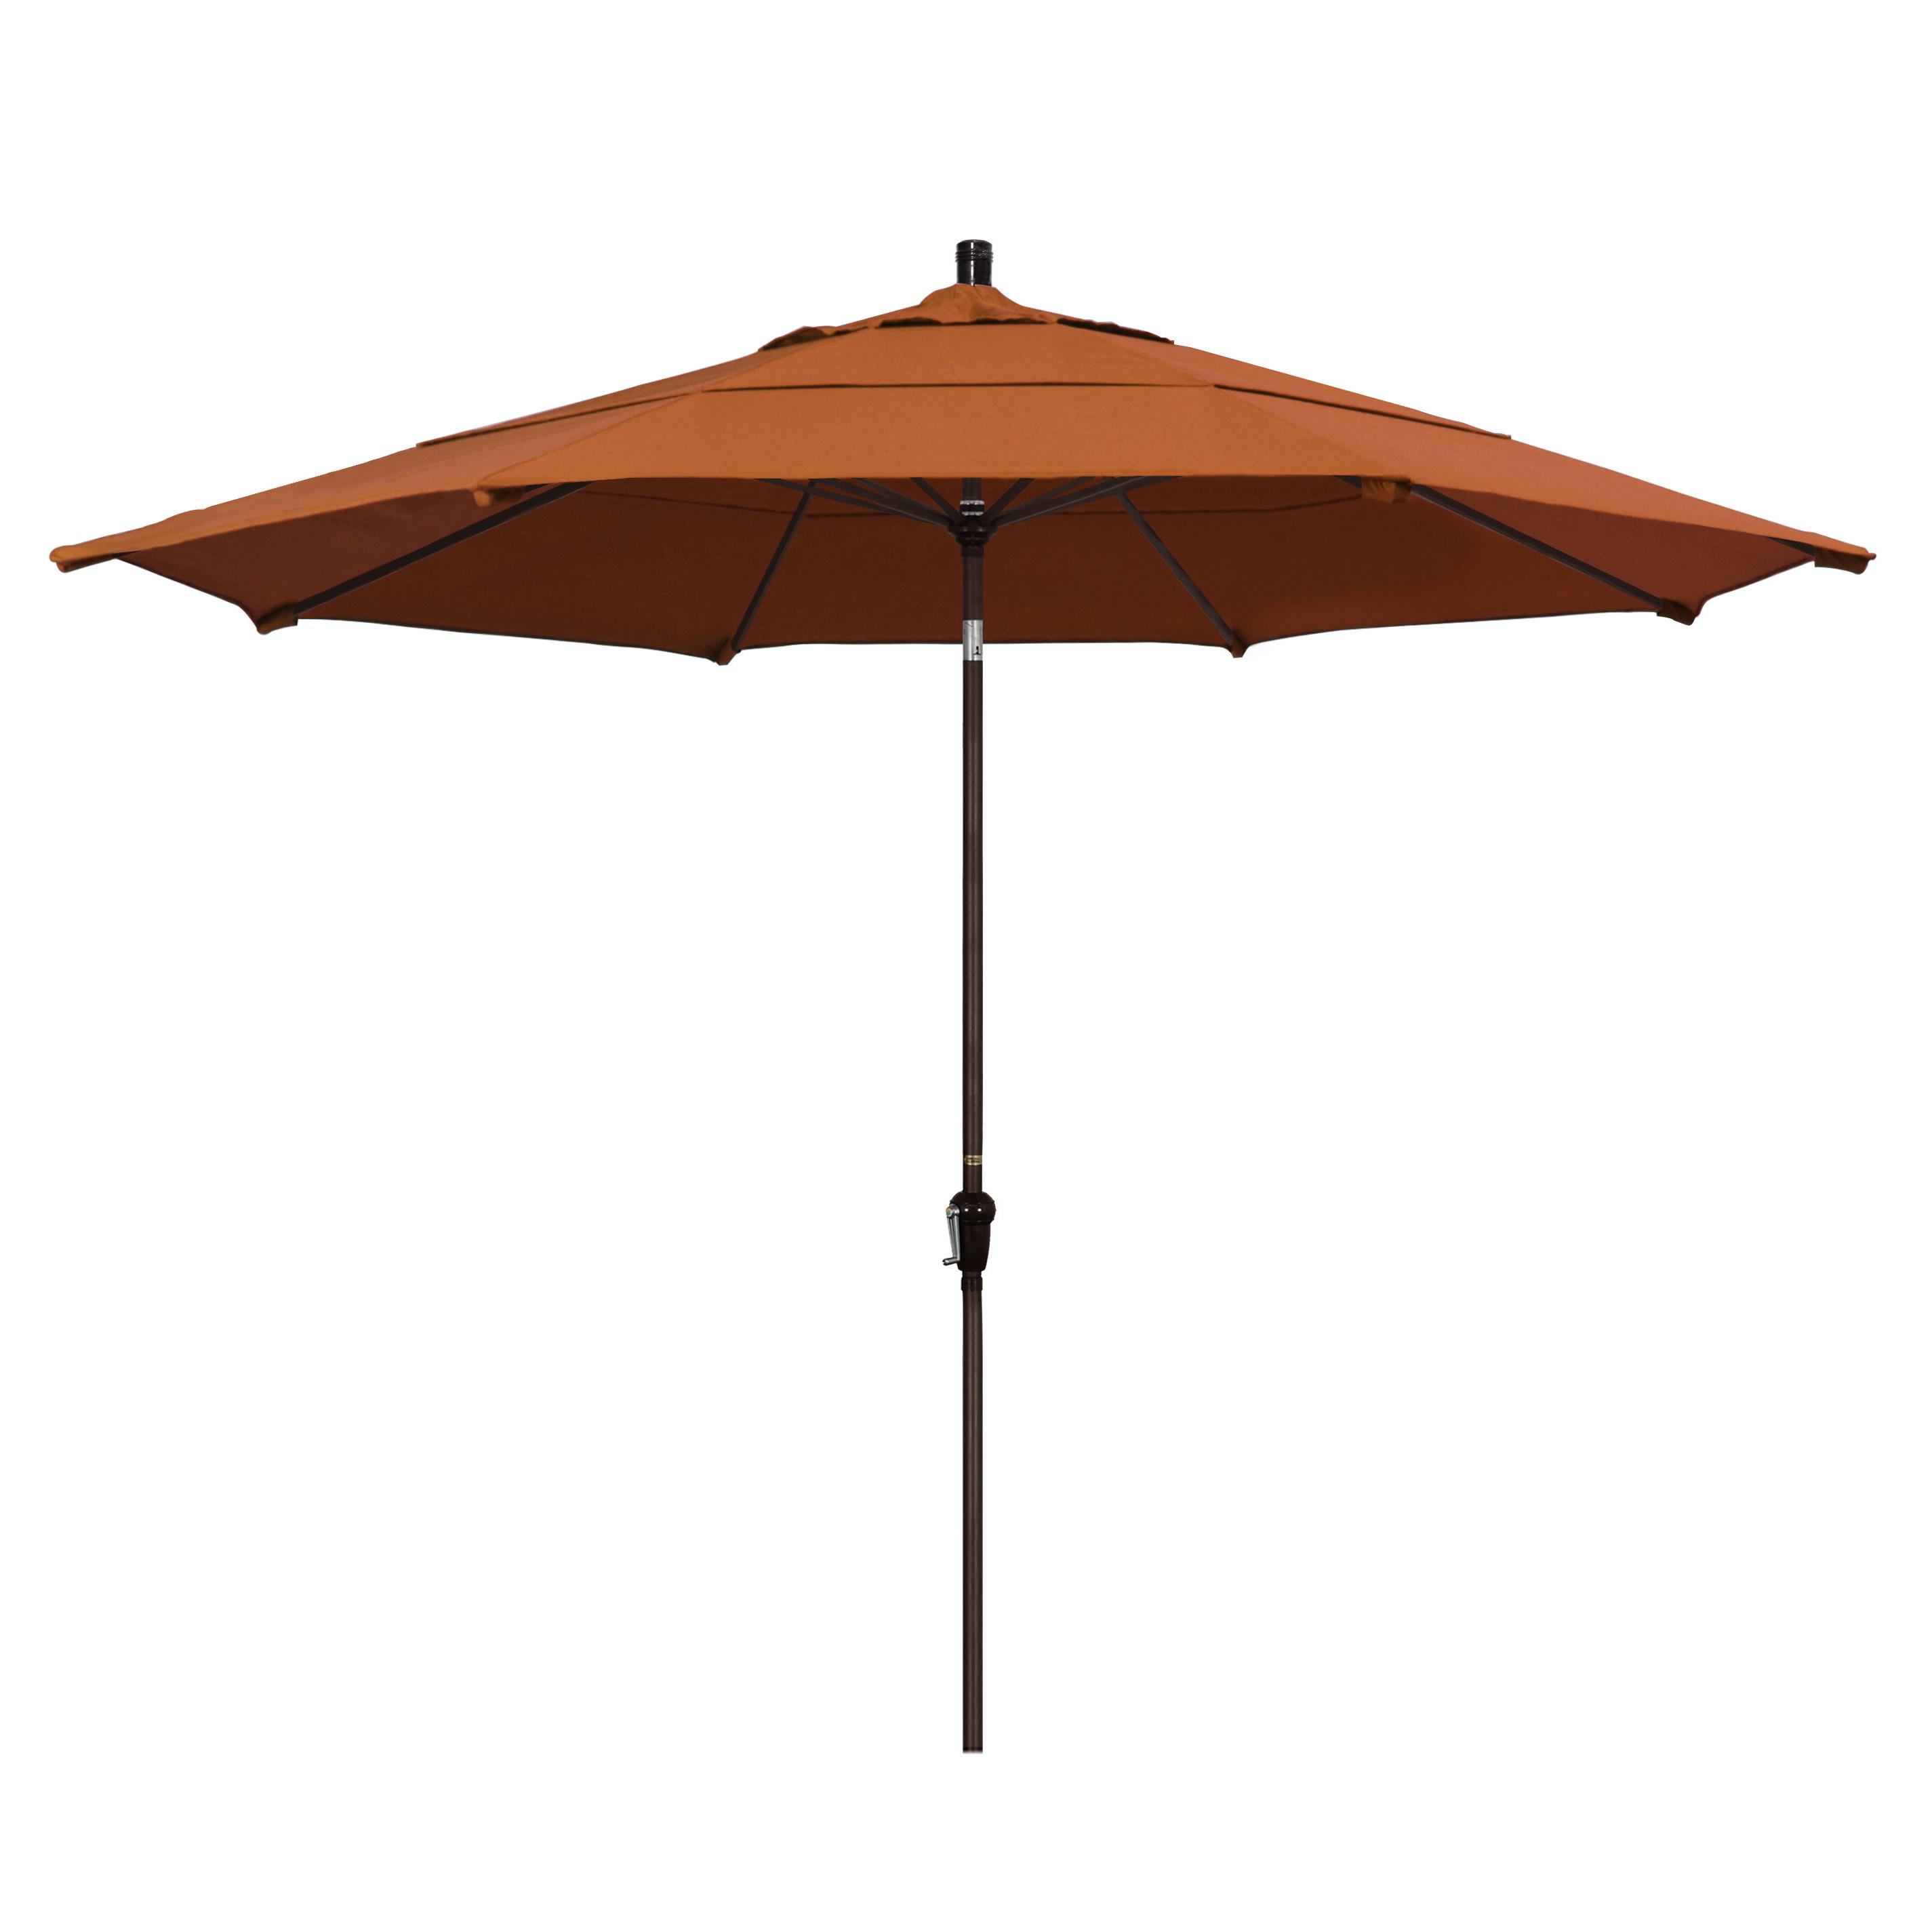 Markley Market Beach Umbrellas For 2020 Mullaney 11' Market Sunbrella Umbrella (View 5 of 20)